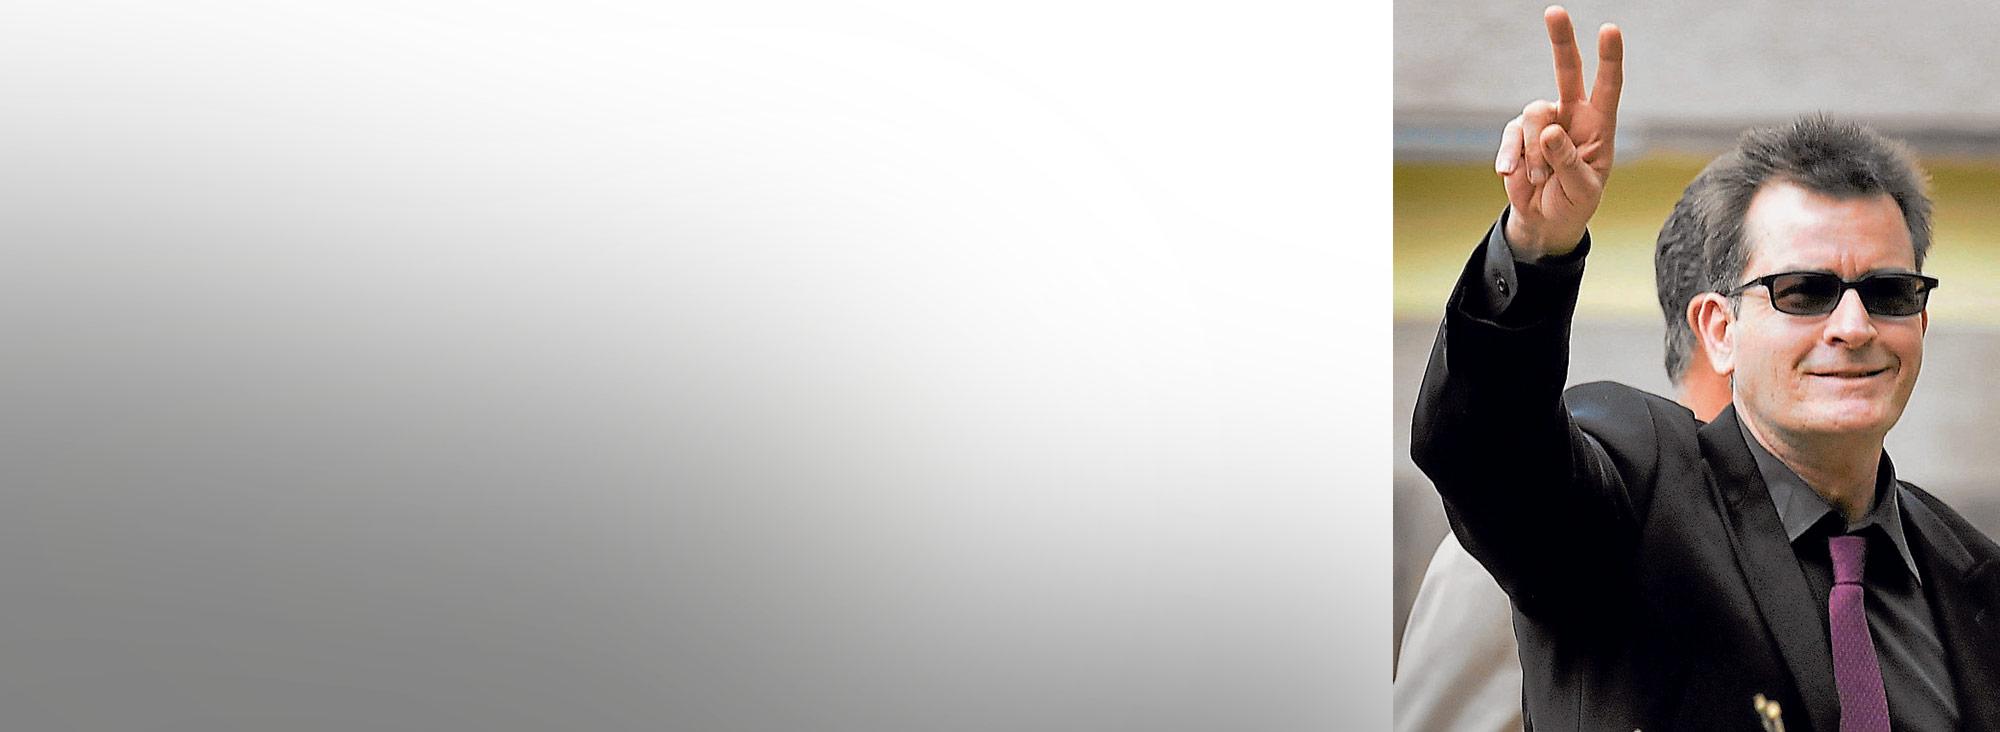 El actor estadounidense Charle Sheen declaró que era portador del virus del VIH